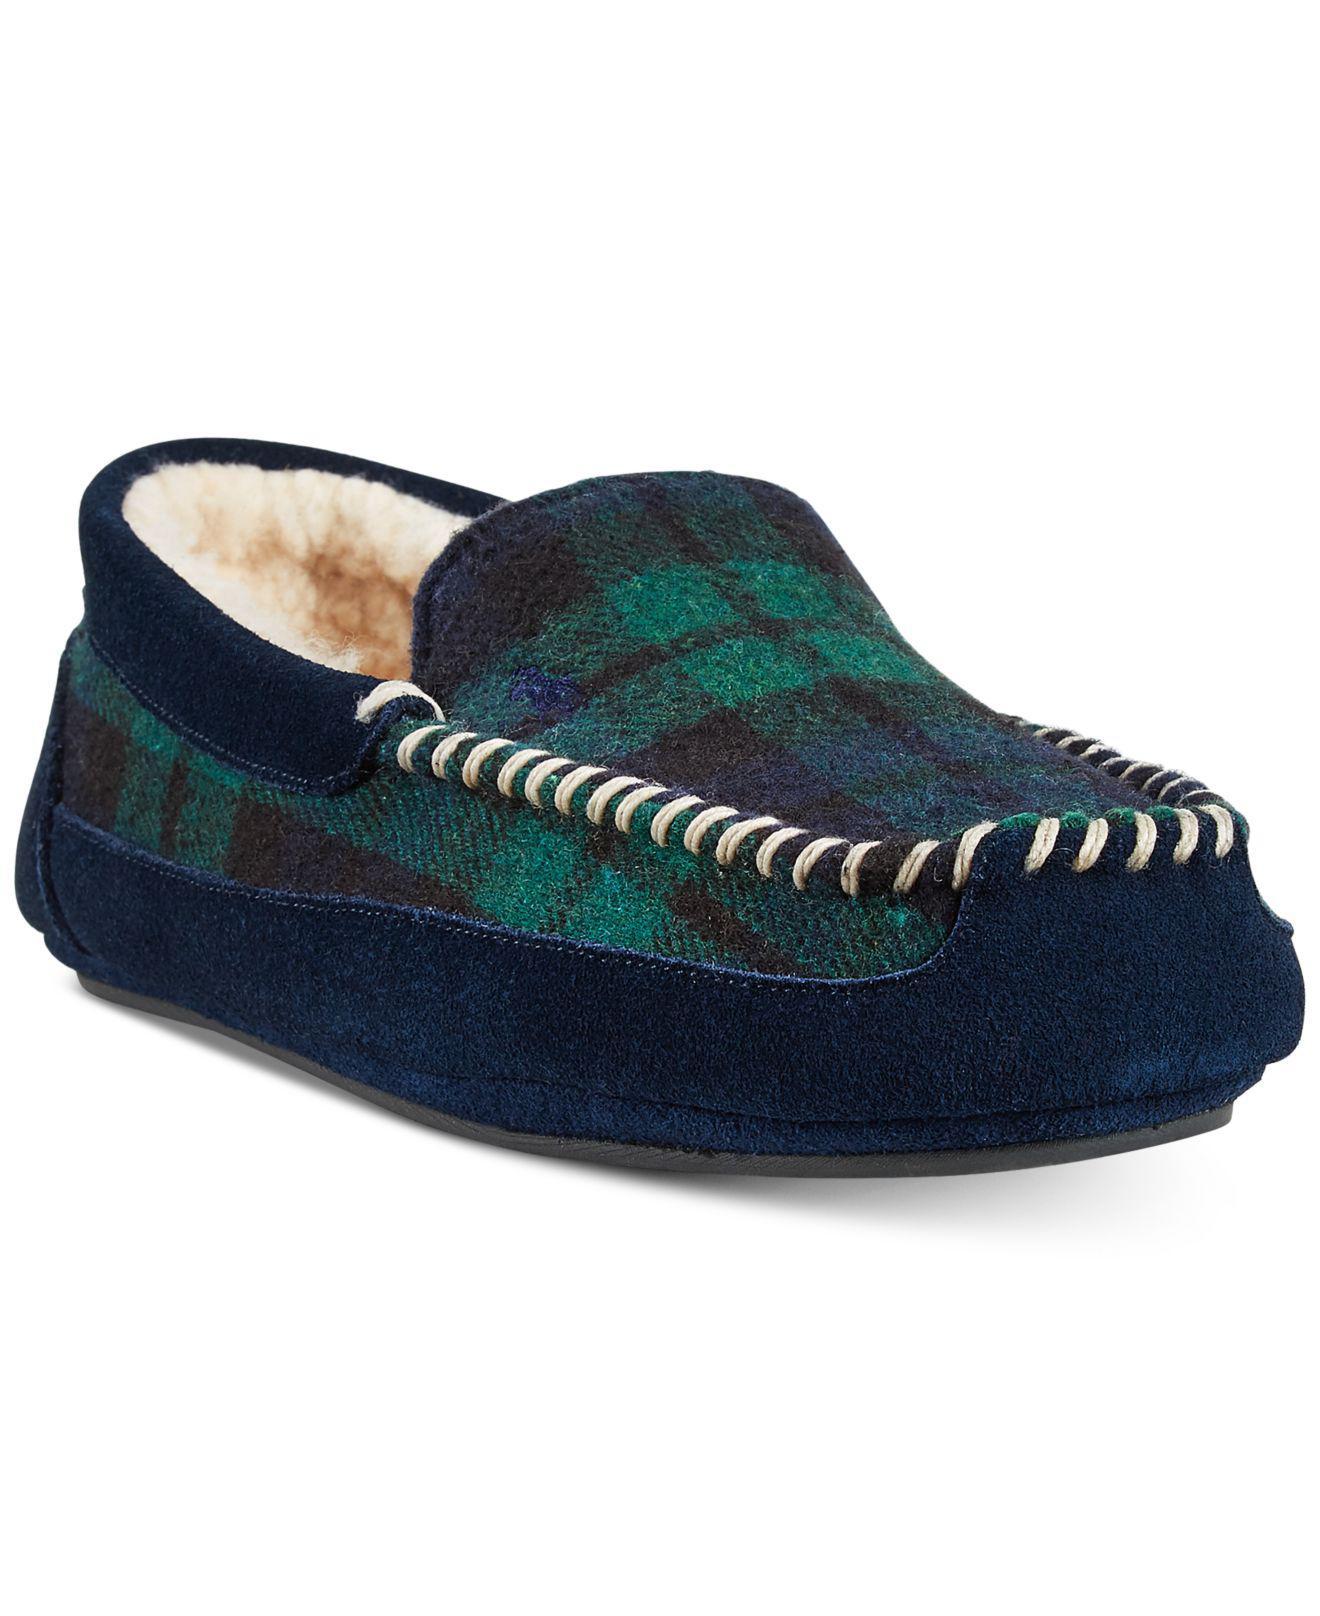 97ea7924cba Lyst - Polo Ralph Lauren Cali Wool Slippers in Blue for Men